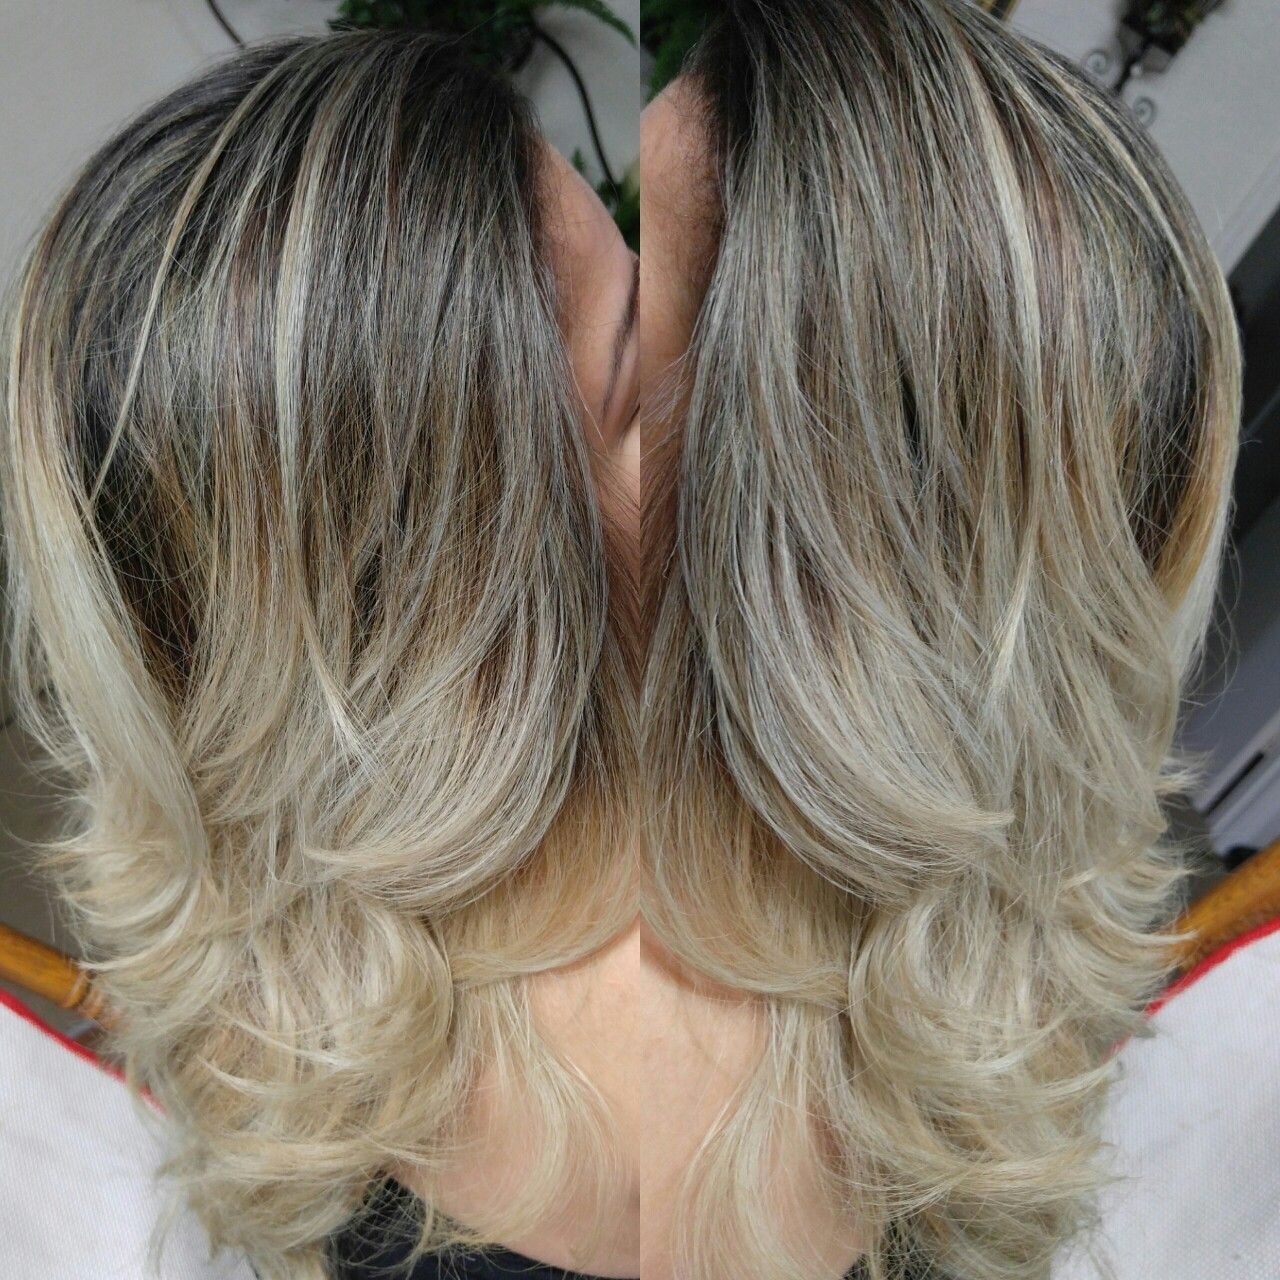 #summerhair #bayalage #violetash #btcpics #behindthechair #modernsalon #bayalage #ombre #hairstyles #summerhair #haircolor #haircolour #modernsalon #olaplex #btcpics #styleshopconnect #affinage #longhair  #longhairdontcare #lgv10photography #affinageusa #affinageaustralia #affinagecolor #trycoloredge #tressedtoimpress #couturecuts #sunkissedhighlights #sunkissedhair #licensedtocreate #blondehurr #hudabeauty #cosmoprofbeauty @cosmoprofbeauty #apassionforhair #matrixhair